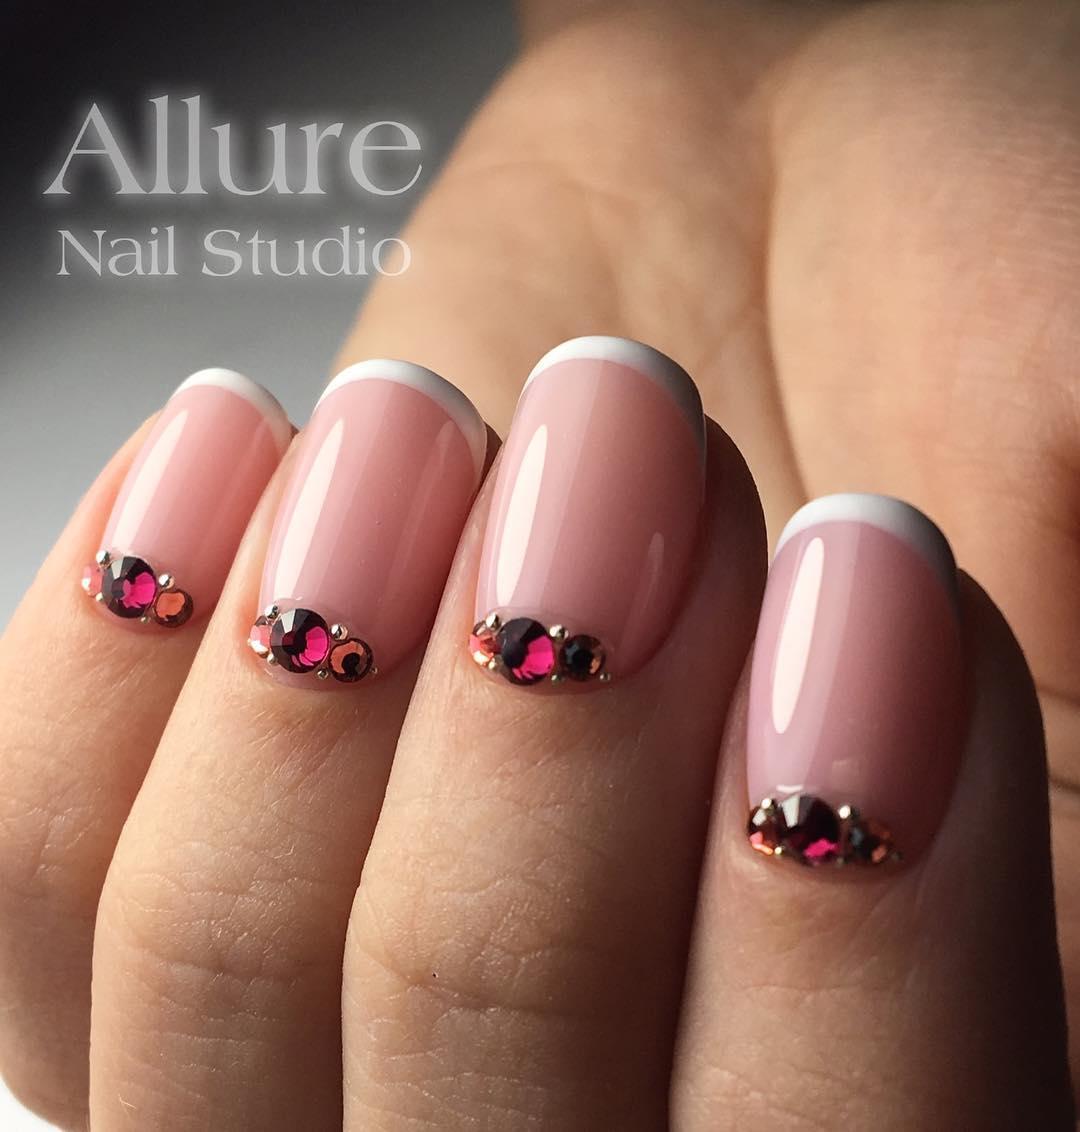 allure_nail_studio-копия.jpg